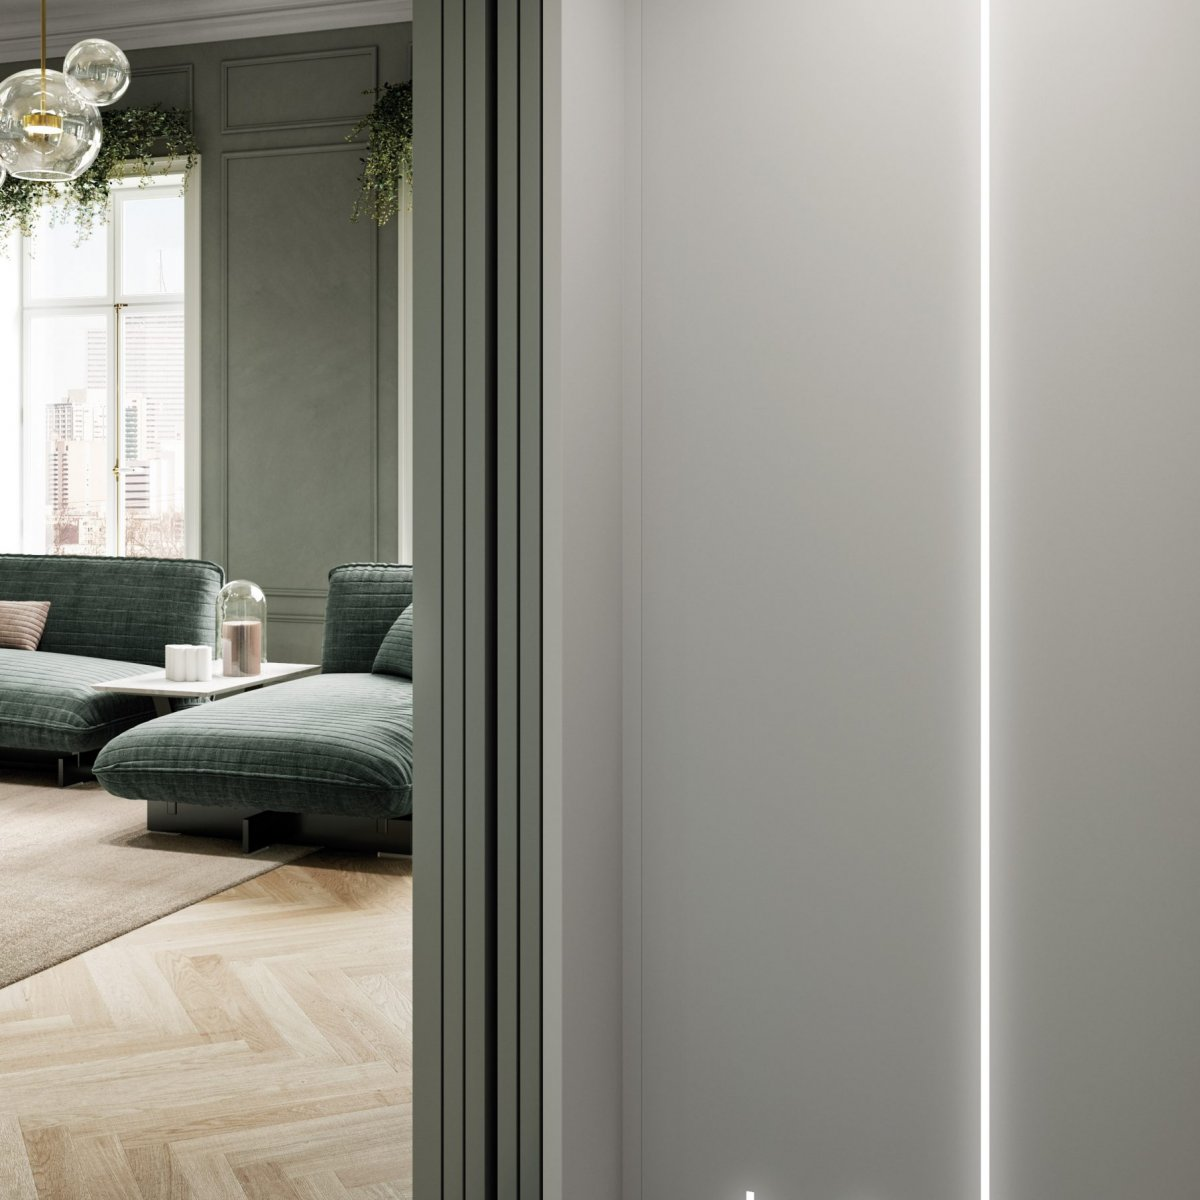 Home Lift   Simplex Elevators Gallery Image 9